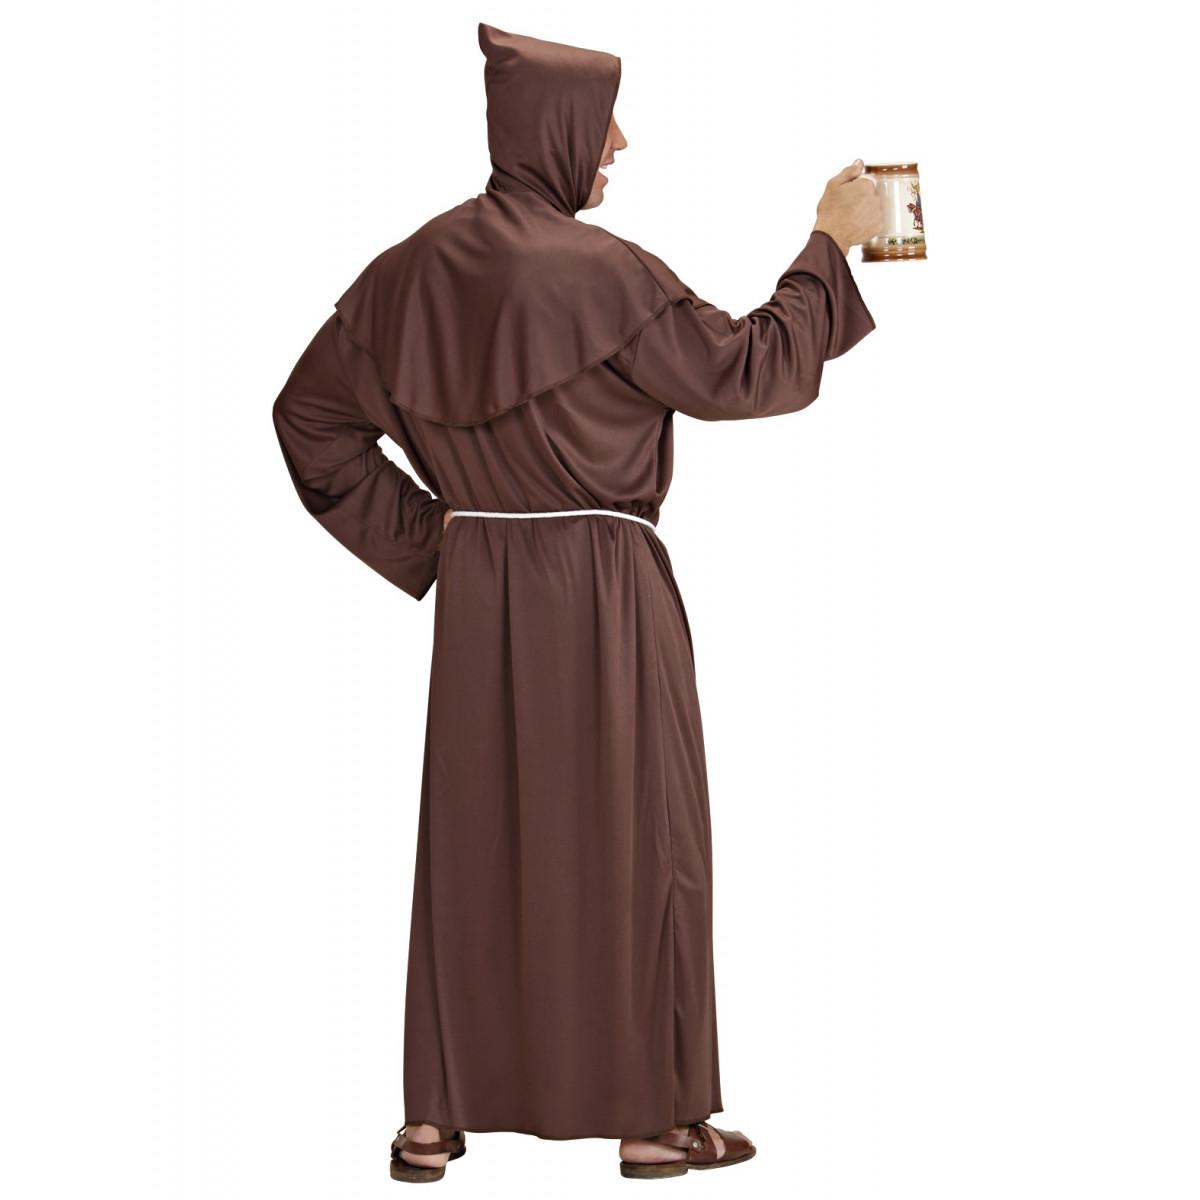 kostum za meniha za maškare 3902